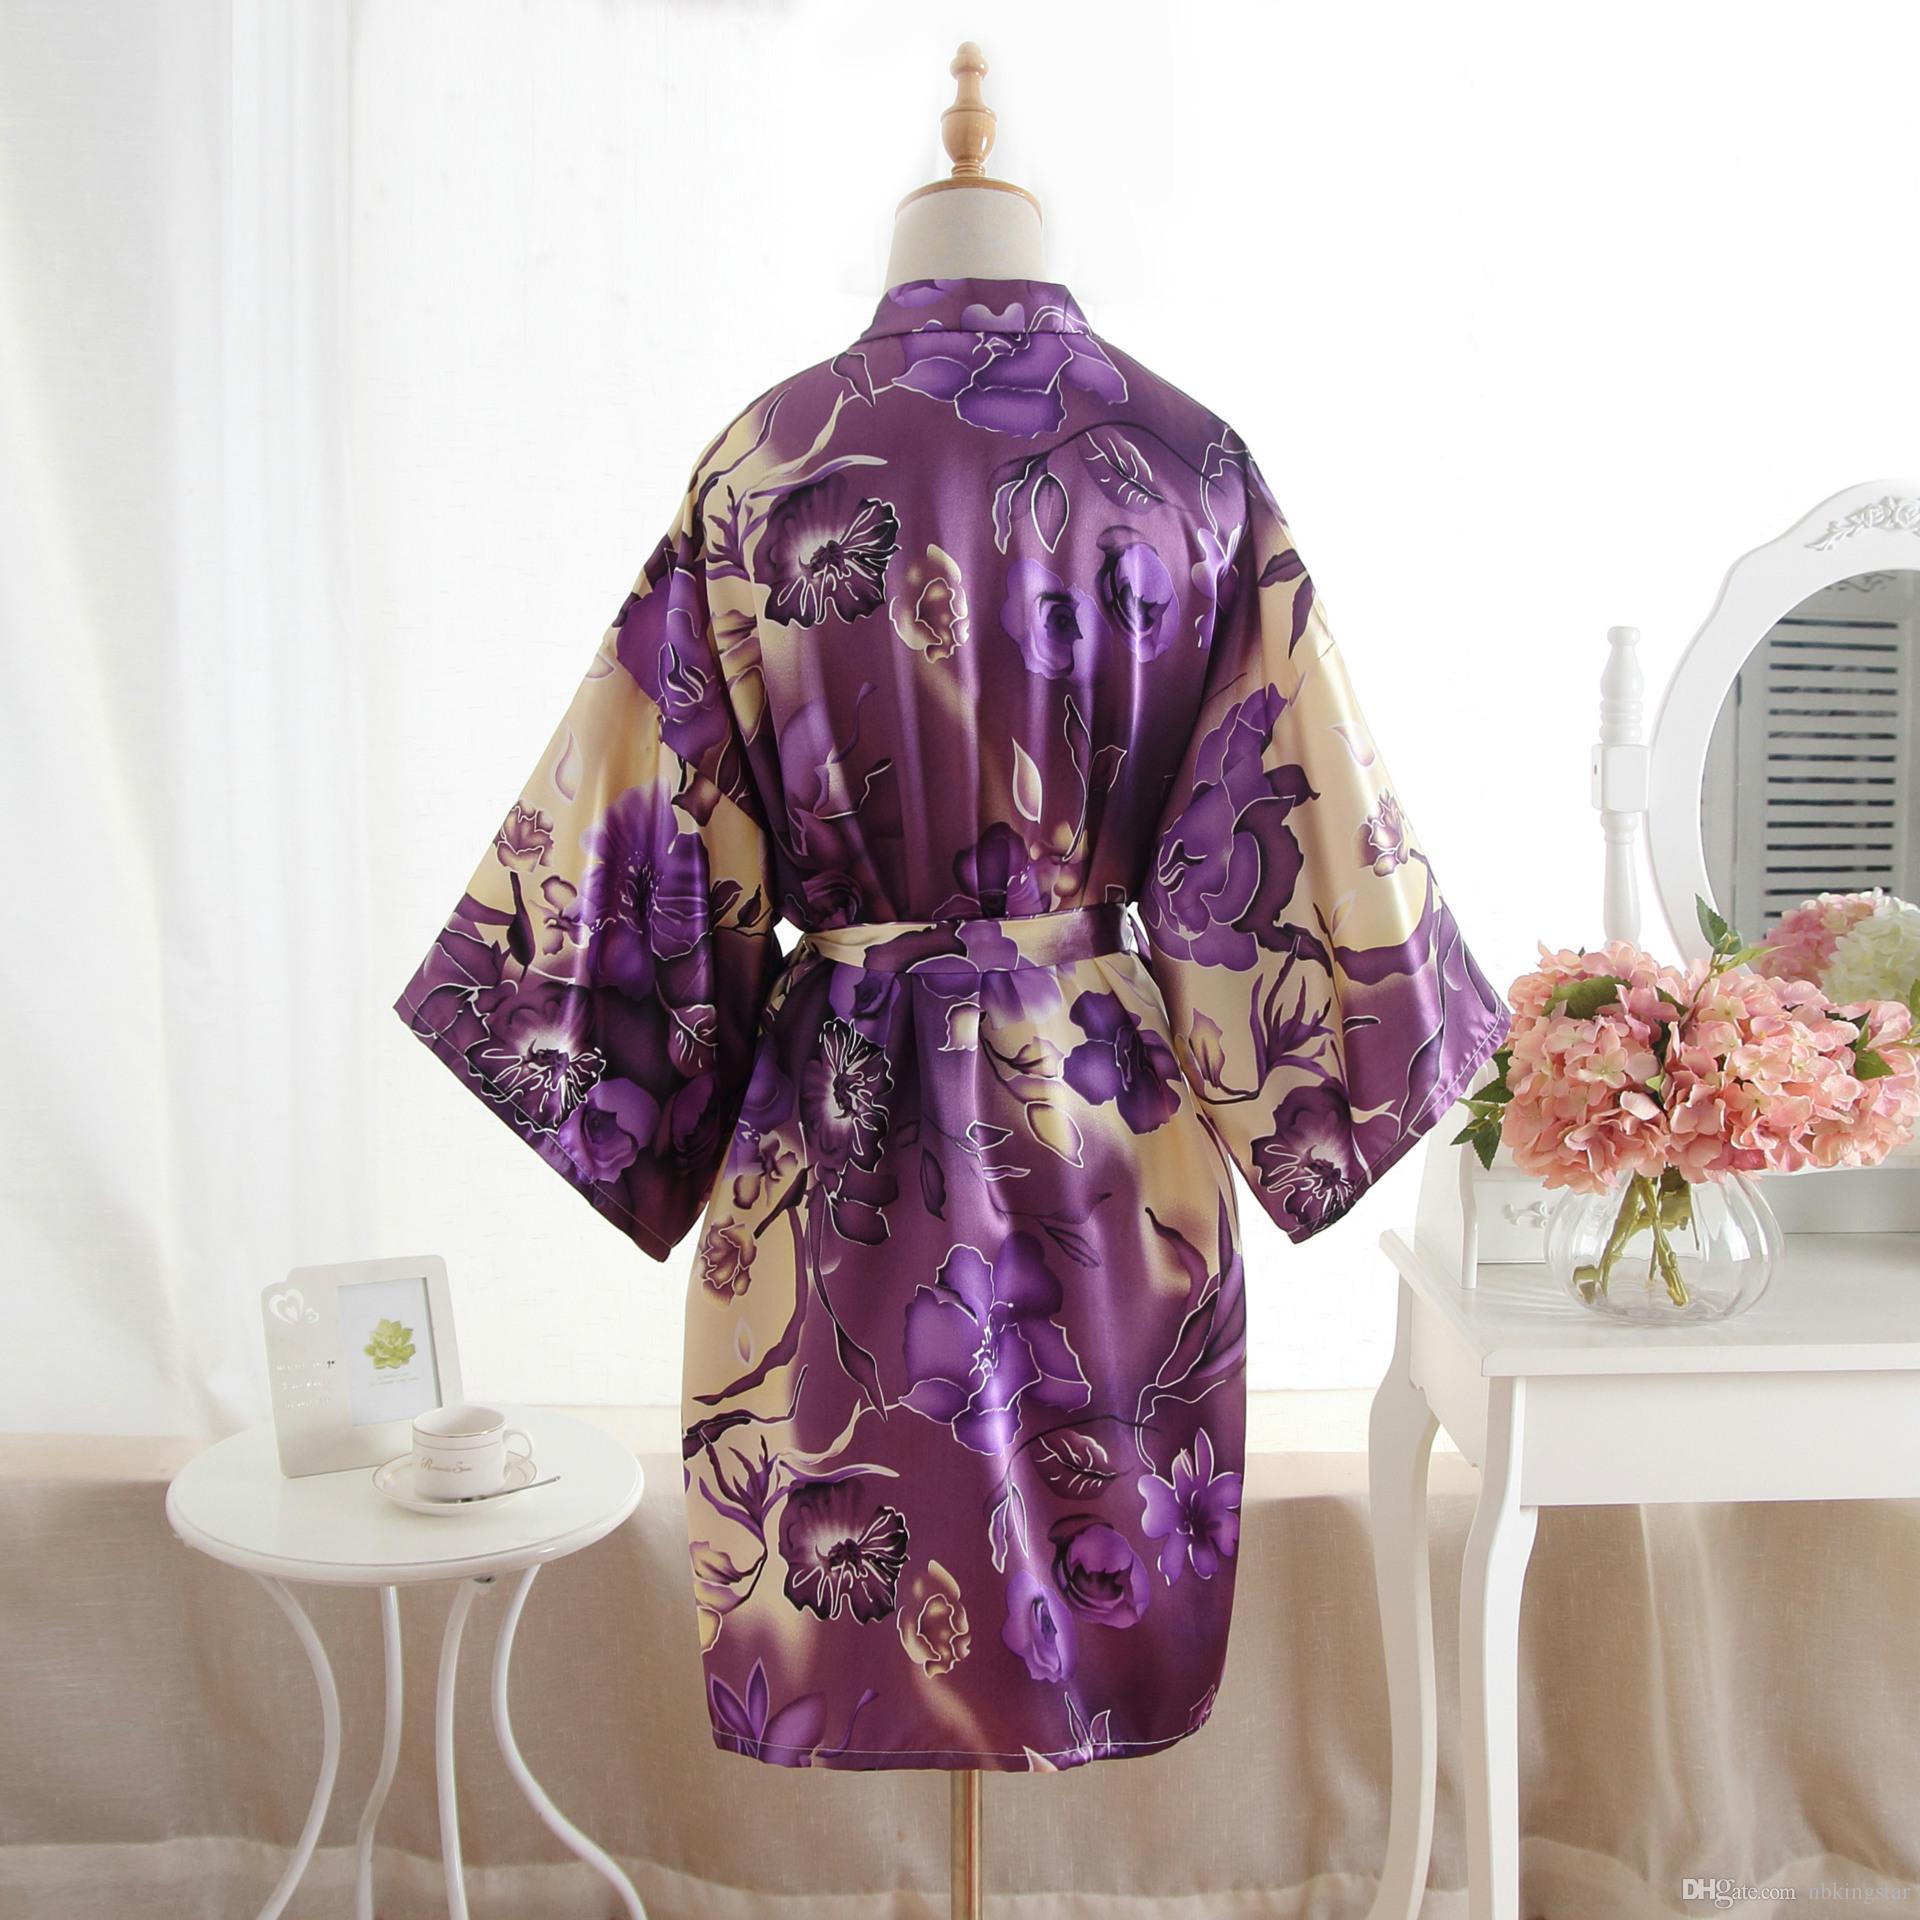 Women Silk Satin Floral Wedding Bride Bridesmaid Robes Lady Floral Bathrobe Flower Print Kimono Dressing Night Gown